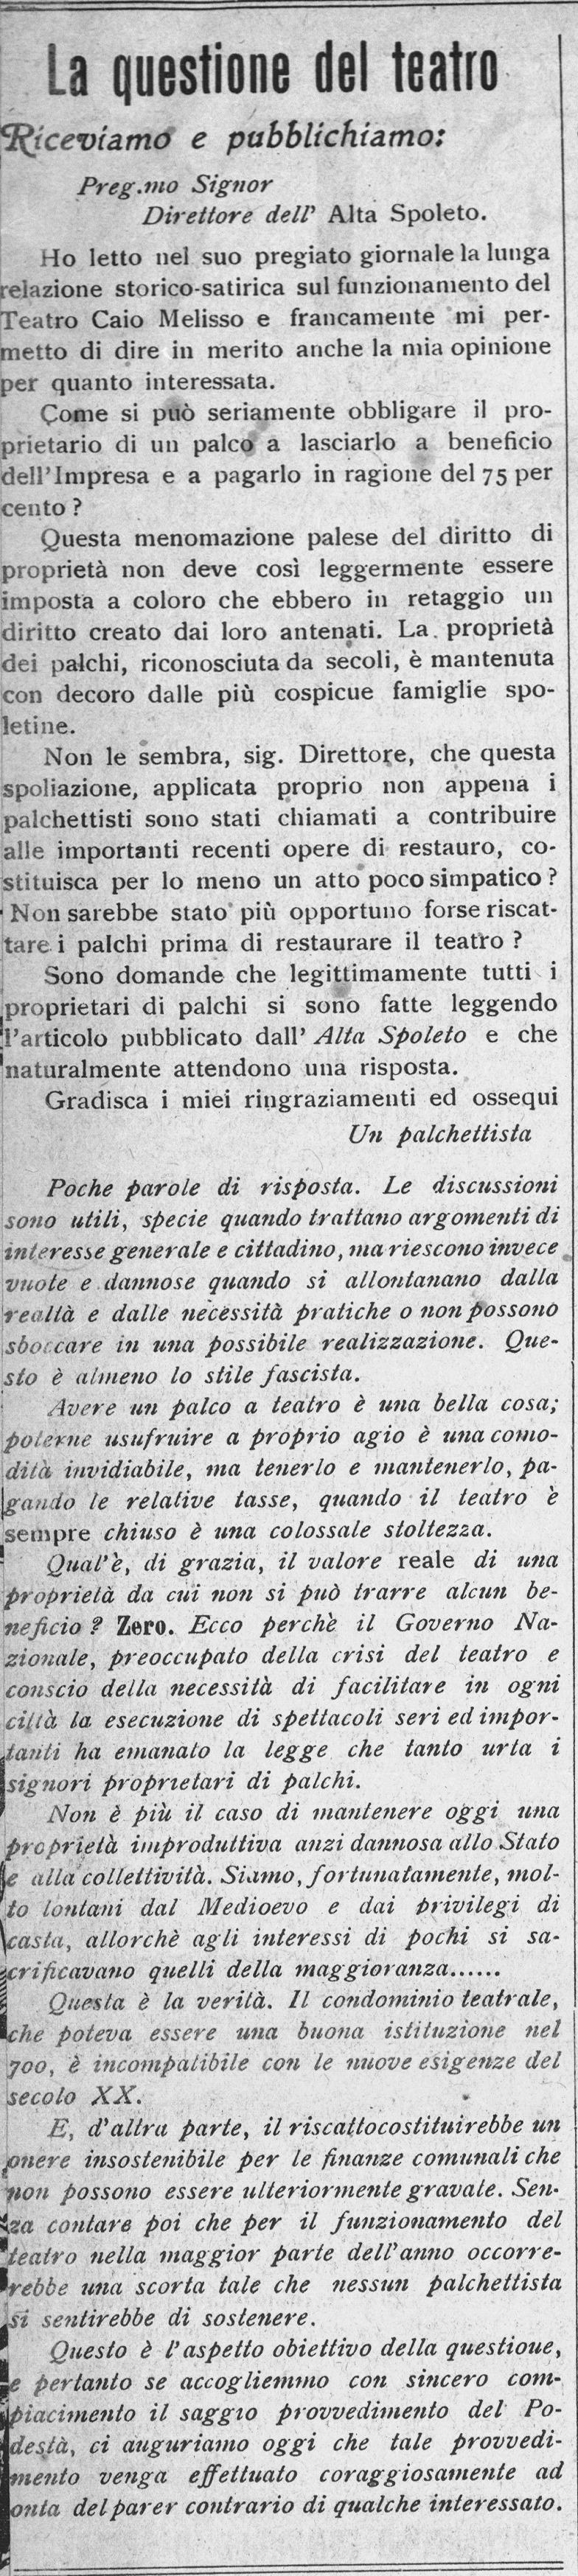 L'Alta Spoleto | 30 novembre 1929